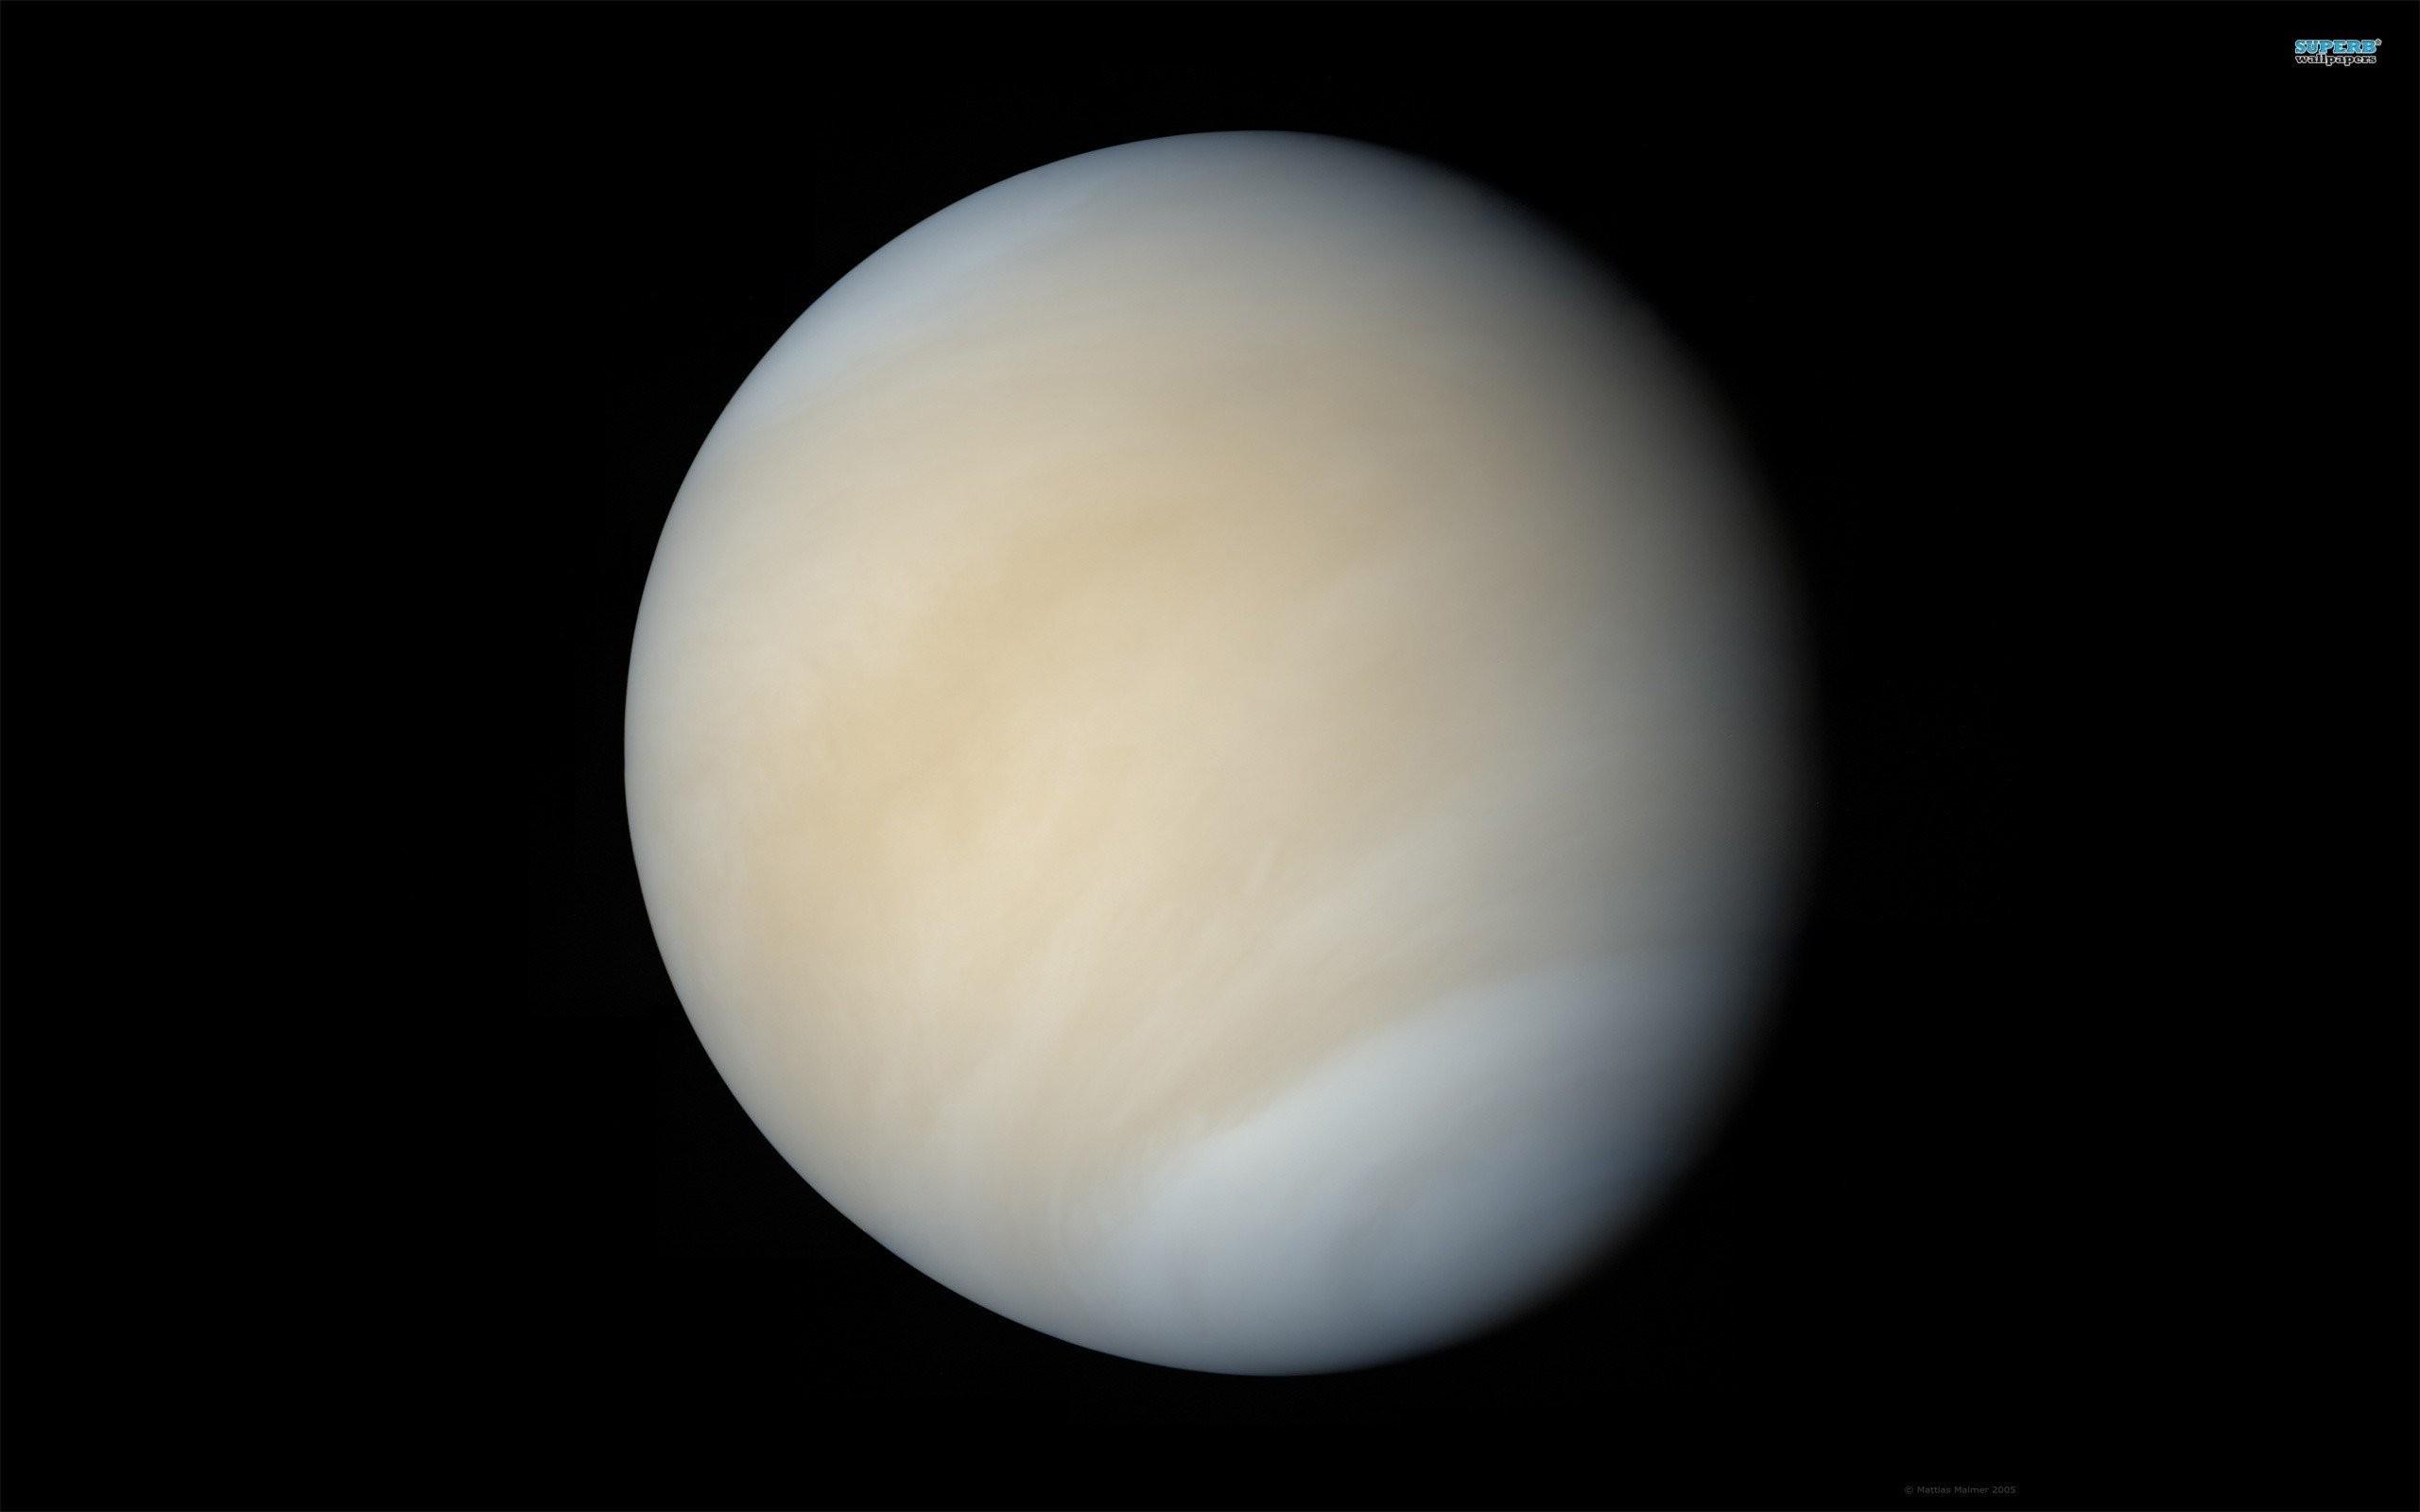 Starsfree Images Planets Hole Black Earth Windows Desktop 2560x1600